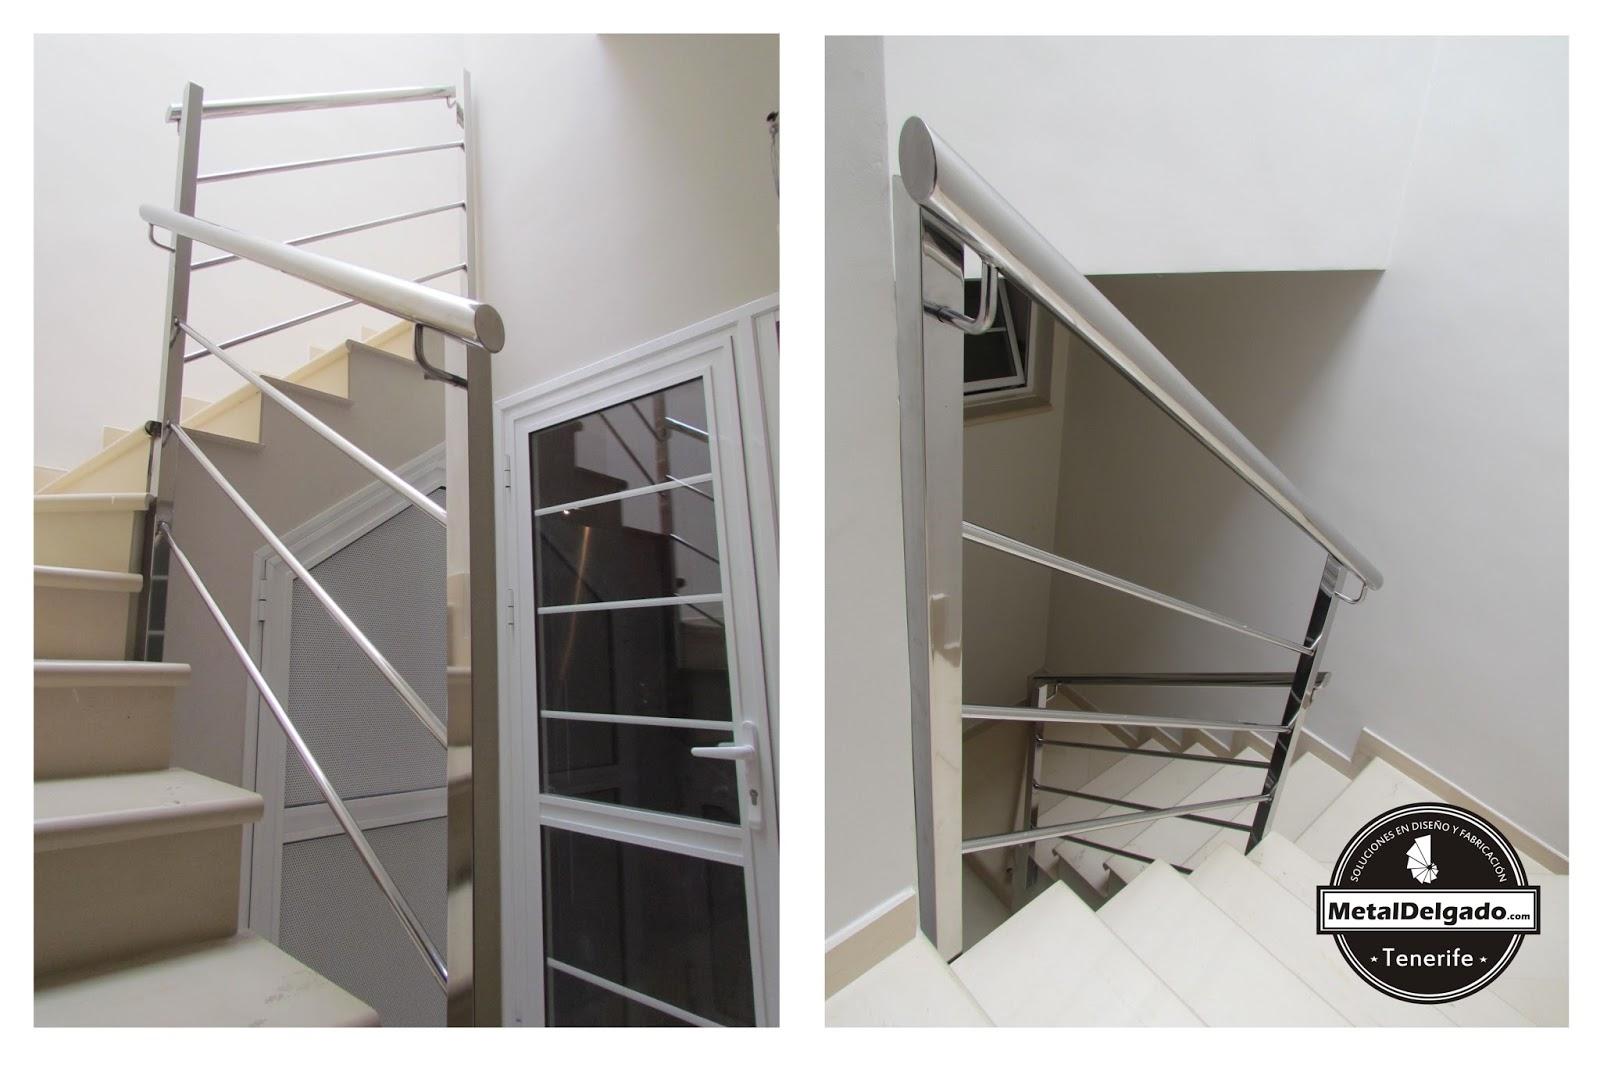 Acero inoxidable tenerife barandas acero inoxidable para escalera - Barandilla cristal escalera ...